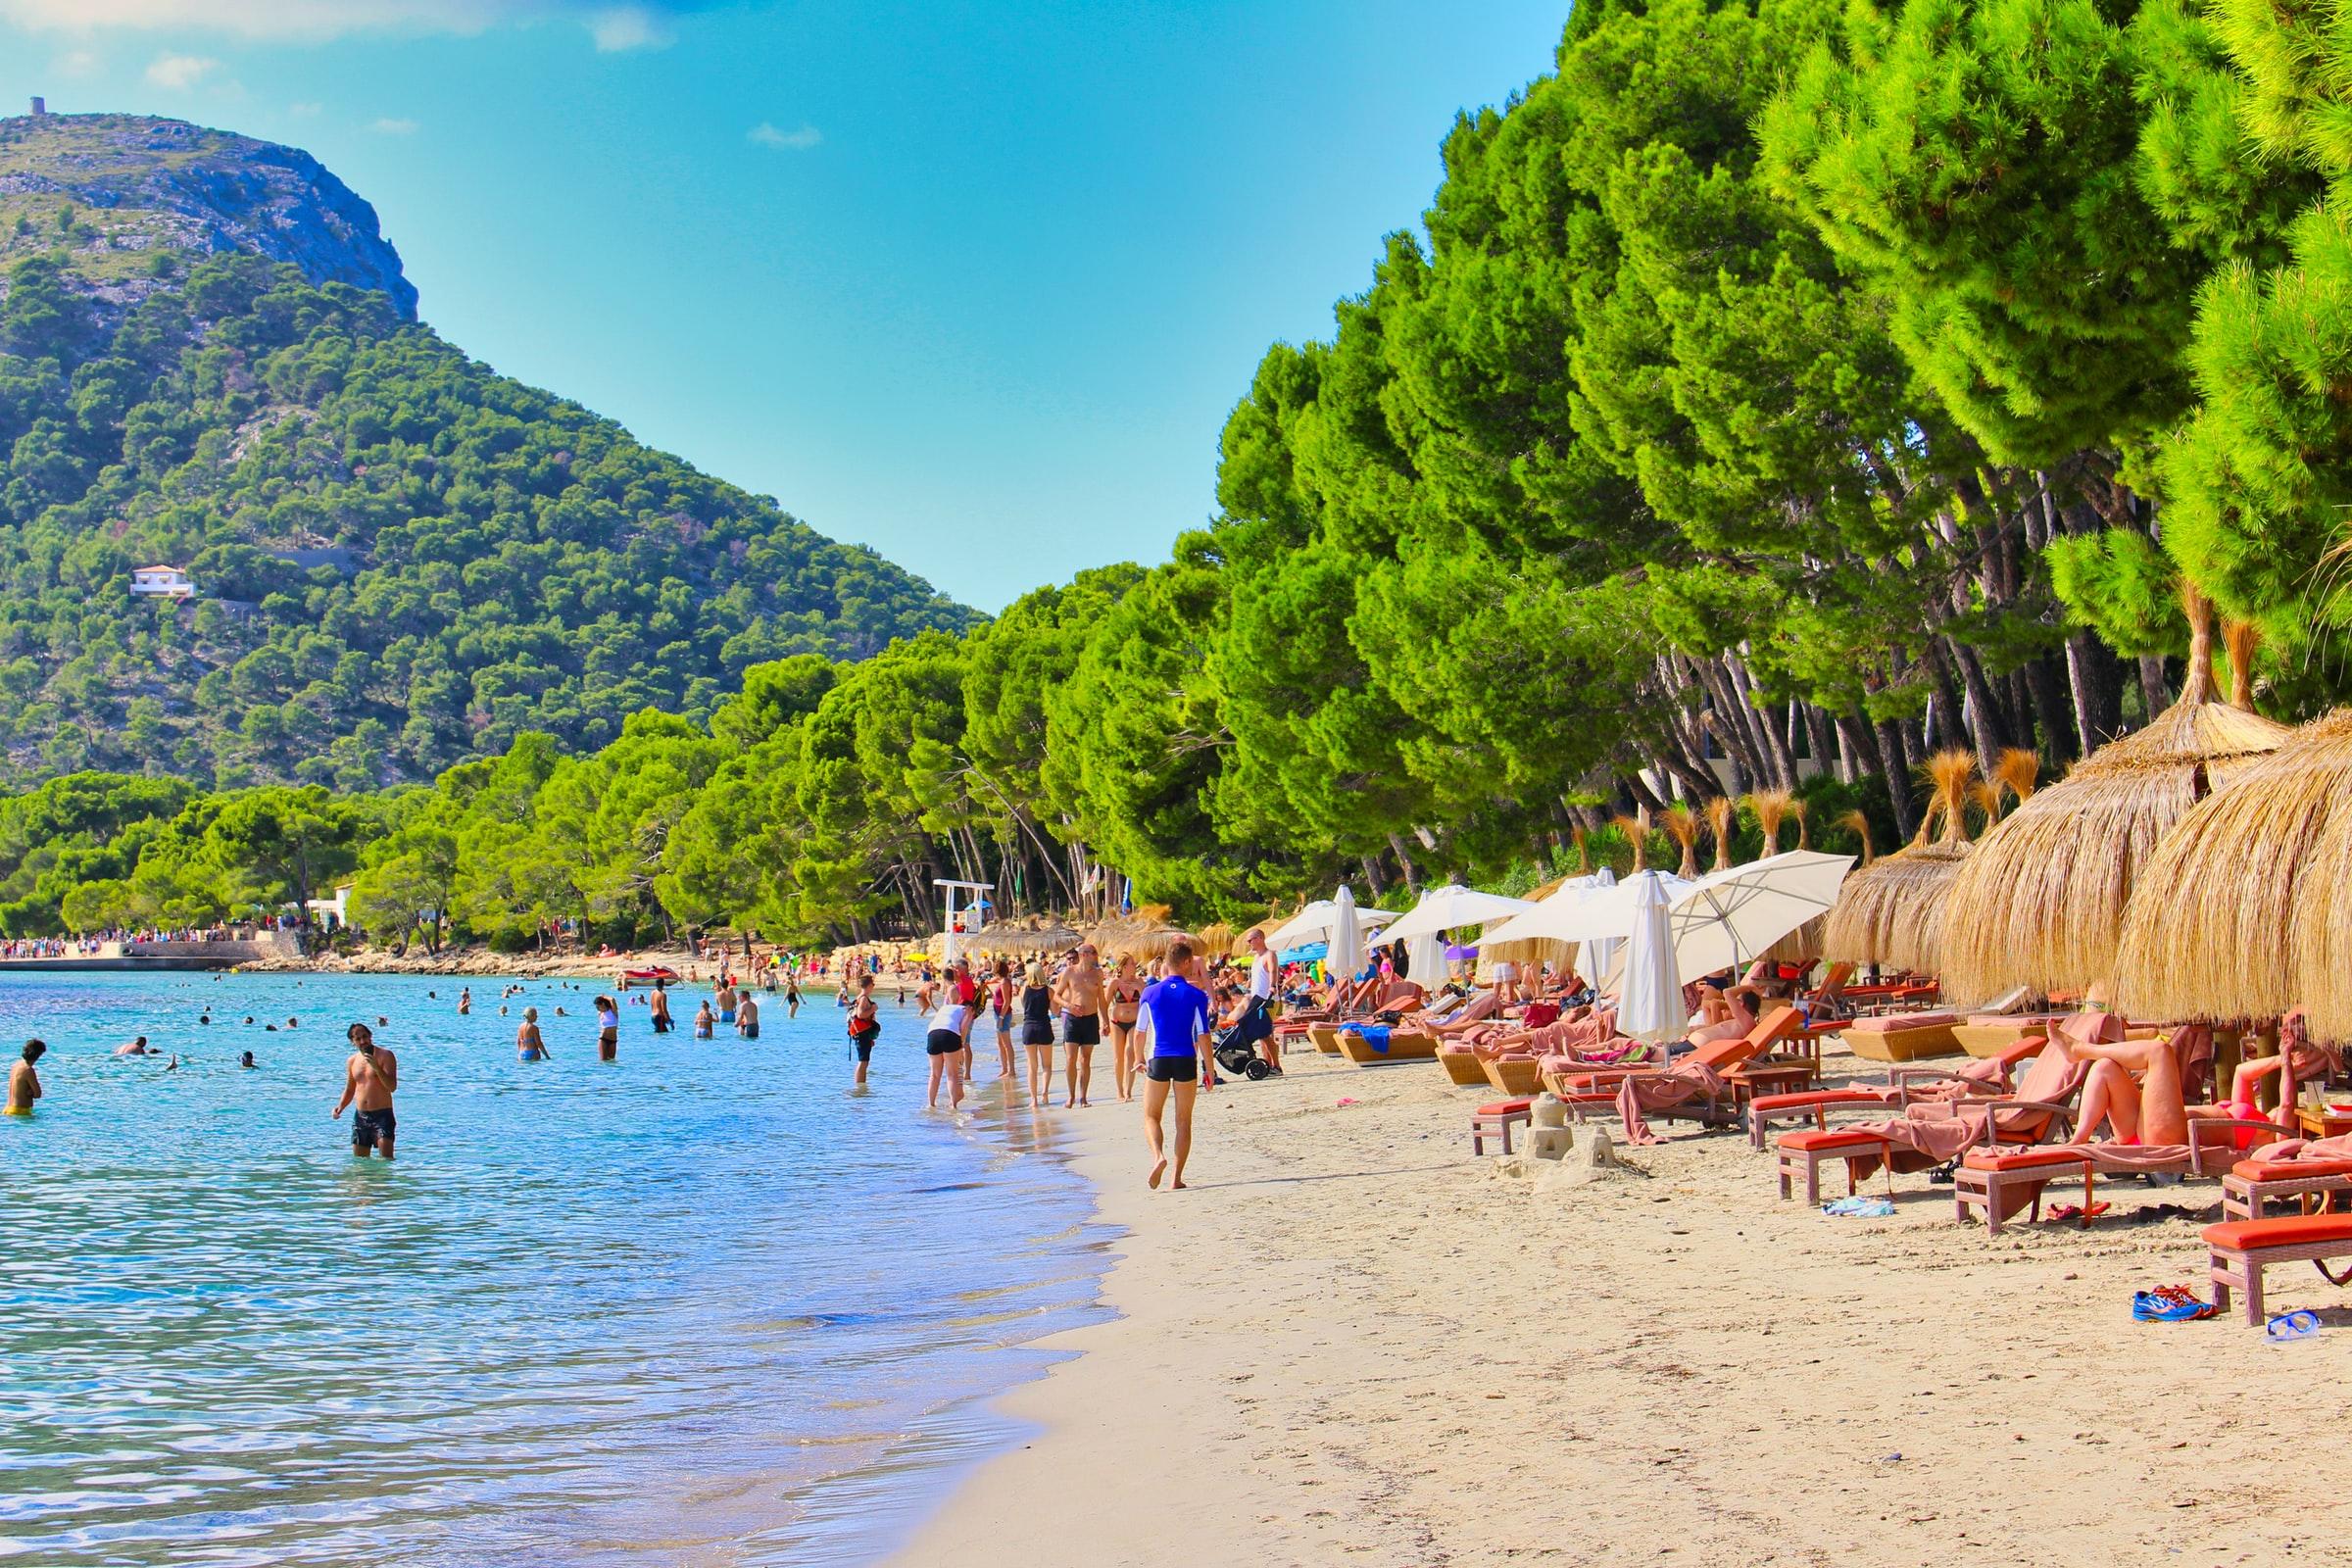 sun-and-beach tourism